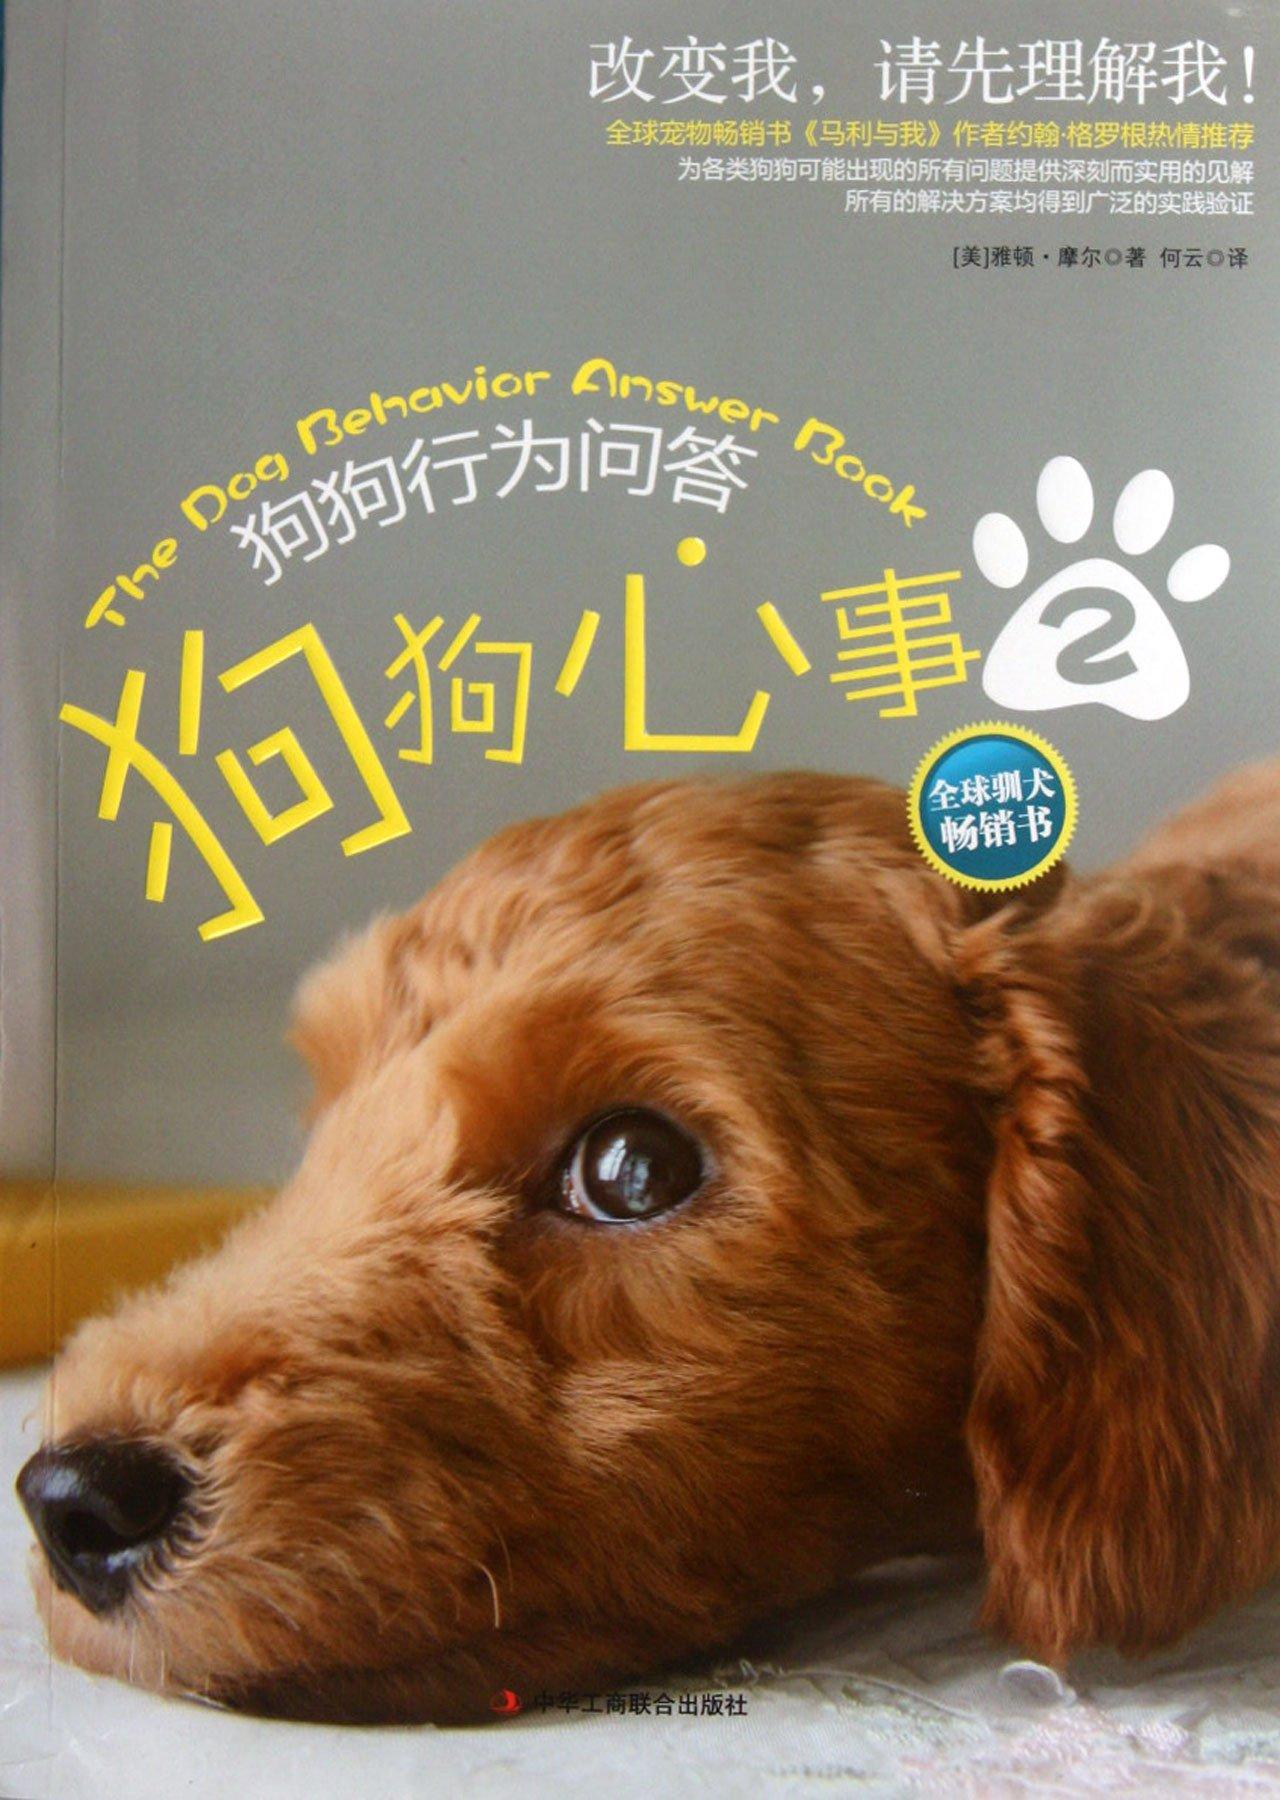 Read Online Dogs mind - dog behavior Q&A -2 (Chinese Edition) pdf epub